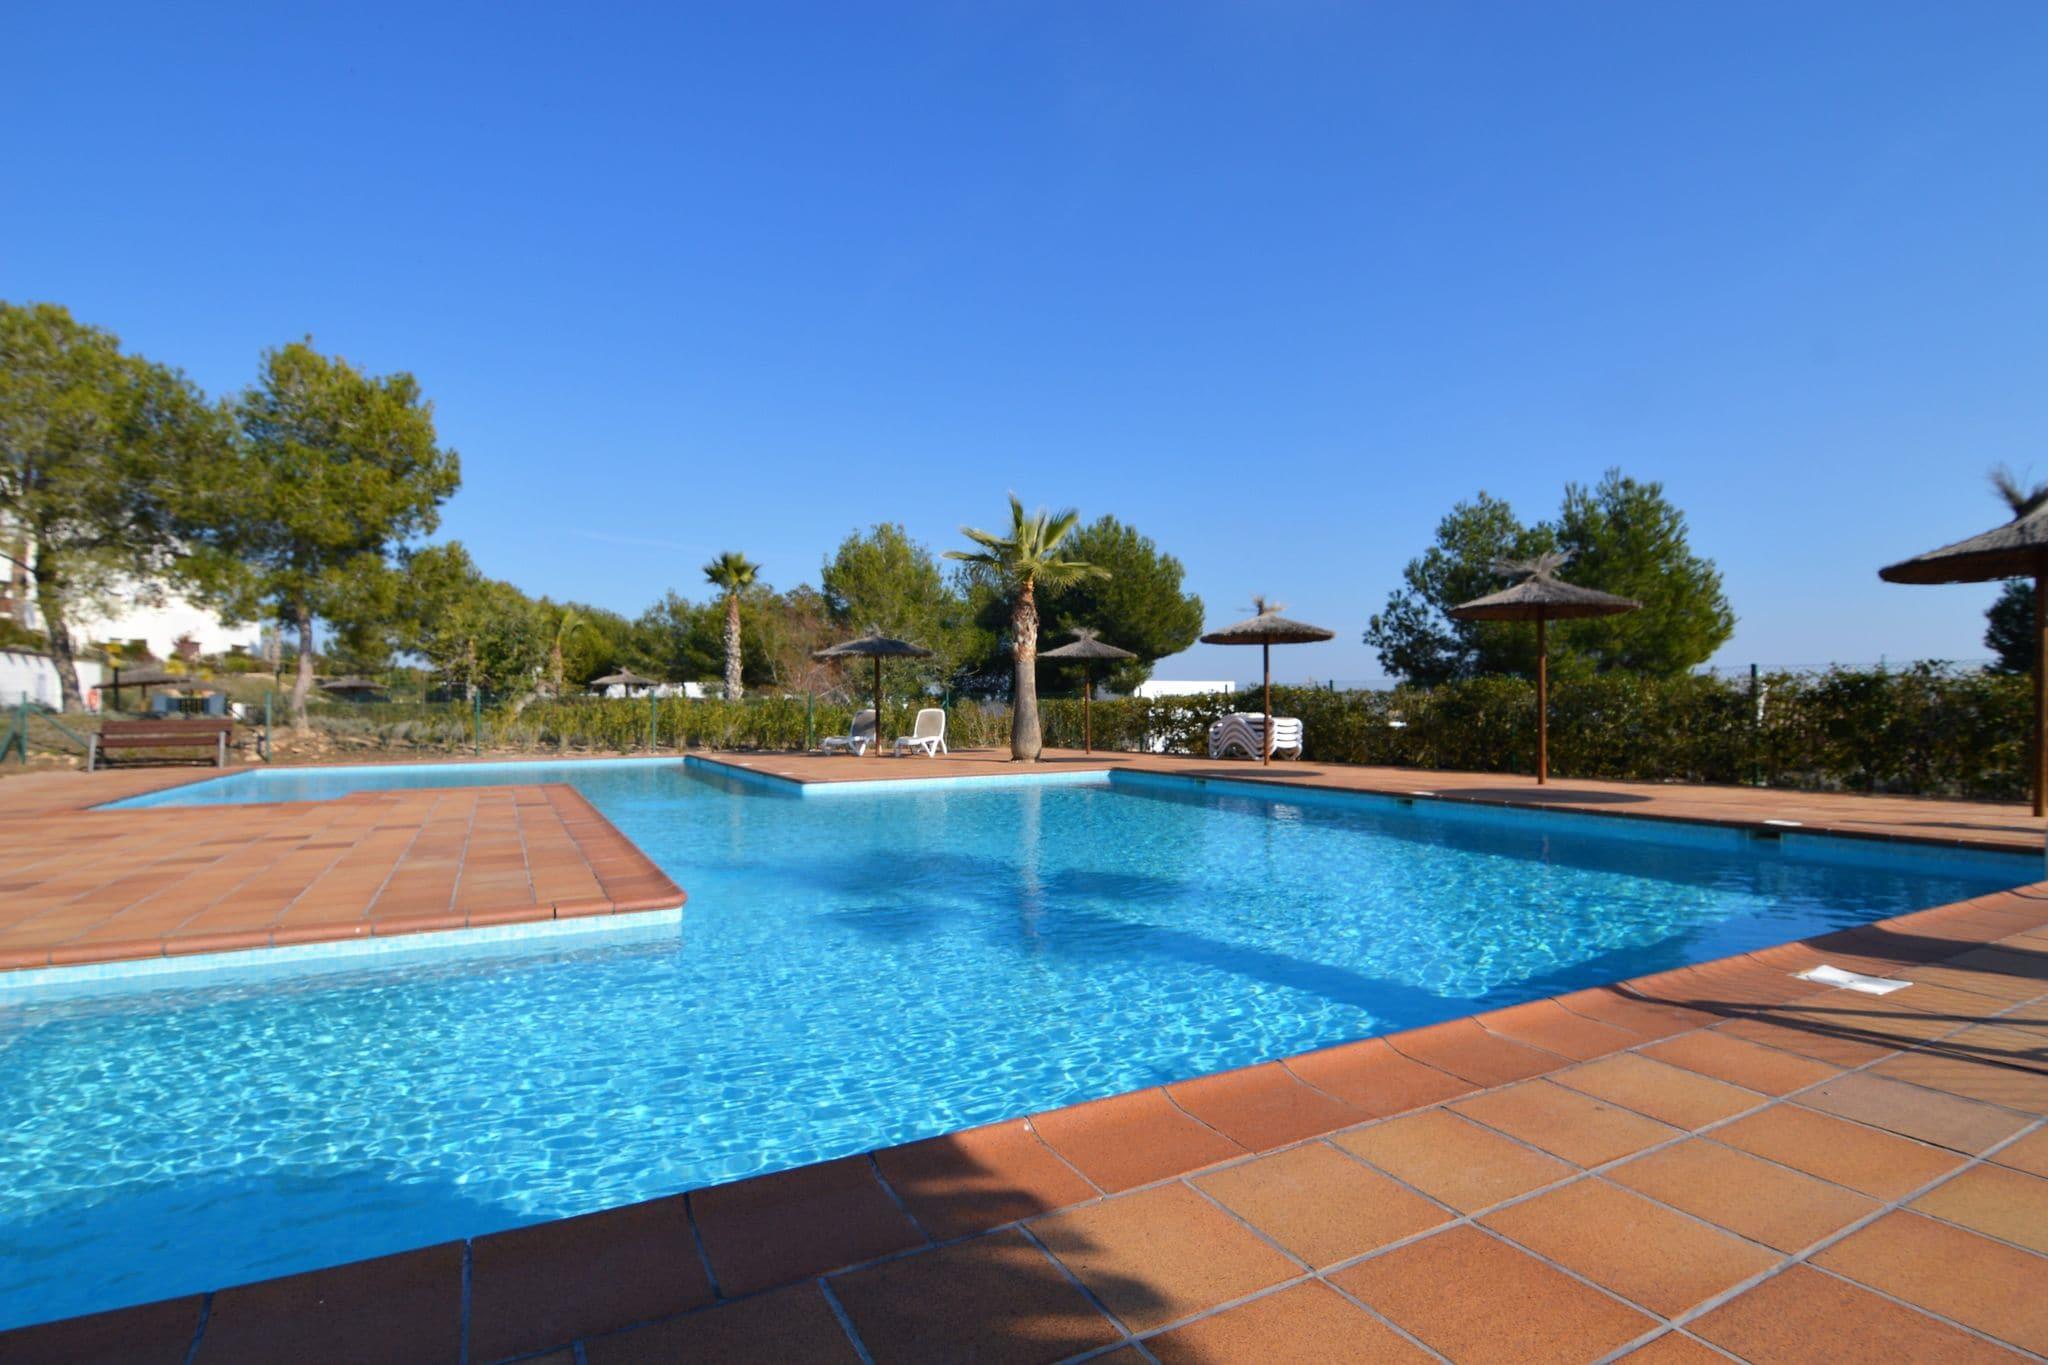 Luxuriöses Appartement an der Costa Blanca mit Swimmingpool